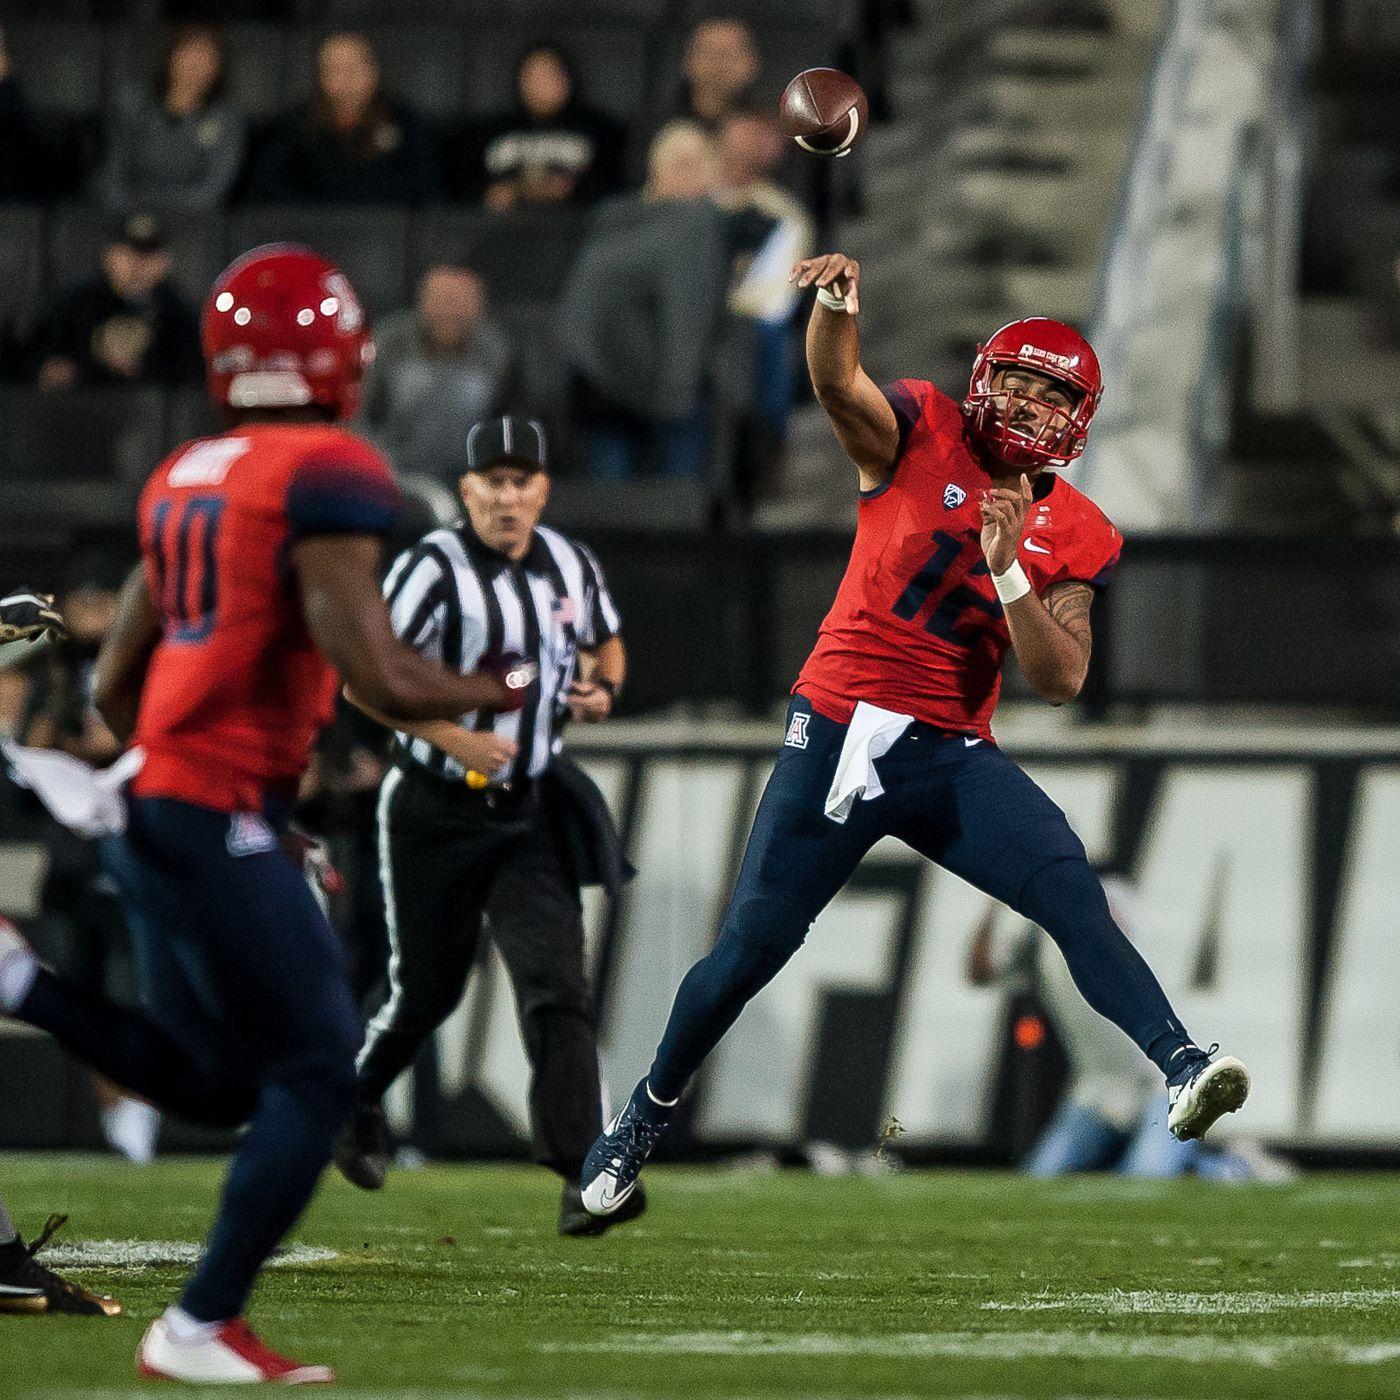 Jack Banda Arizona Wildcats Football Jersey - Red